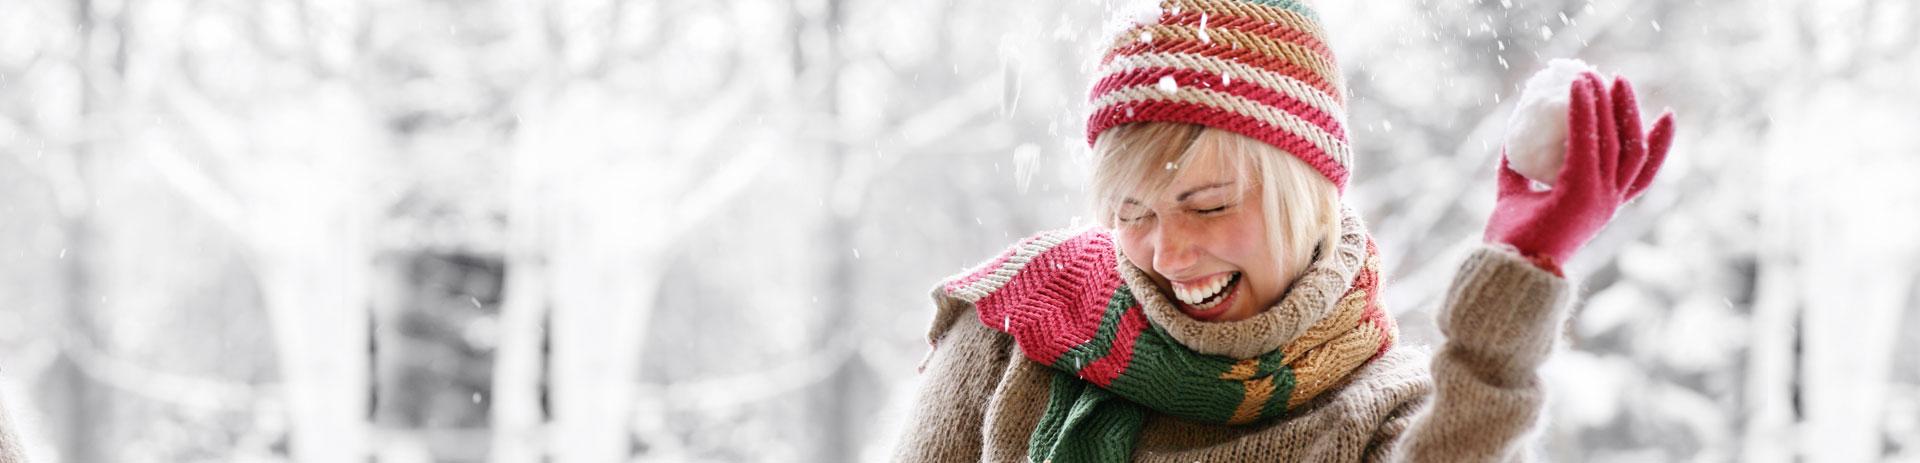 Schneeballwerfende junge Frau